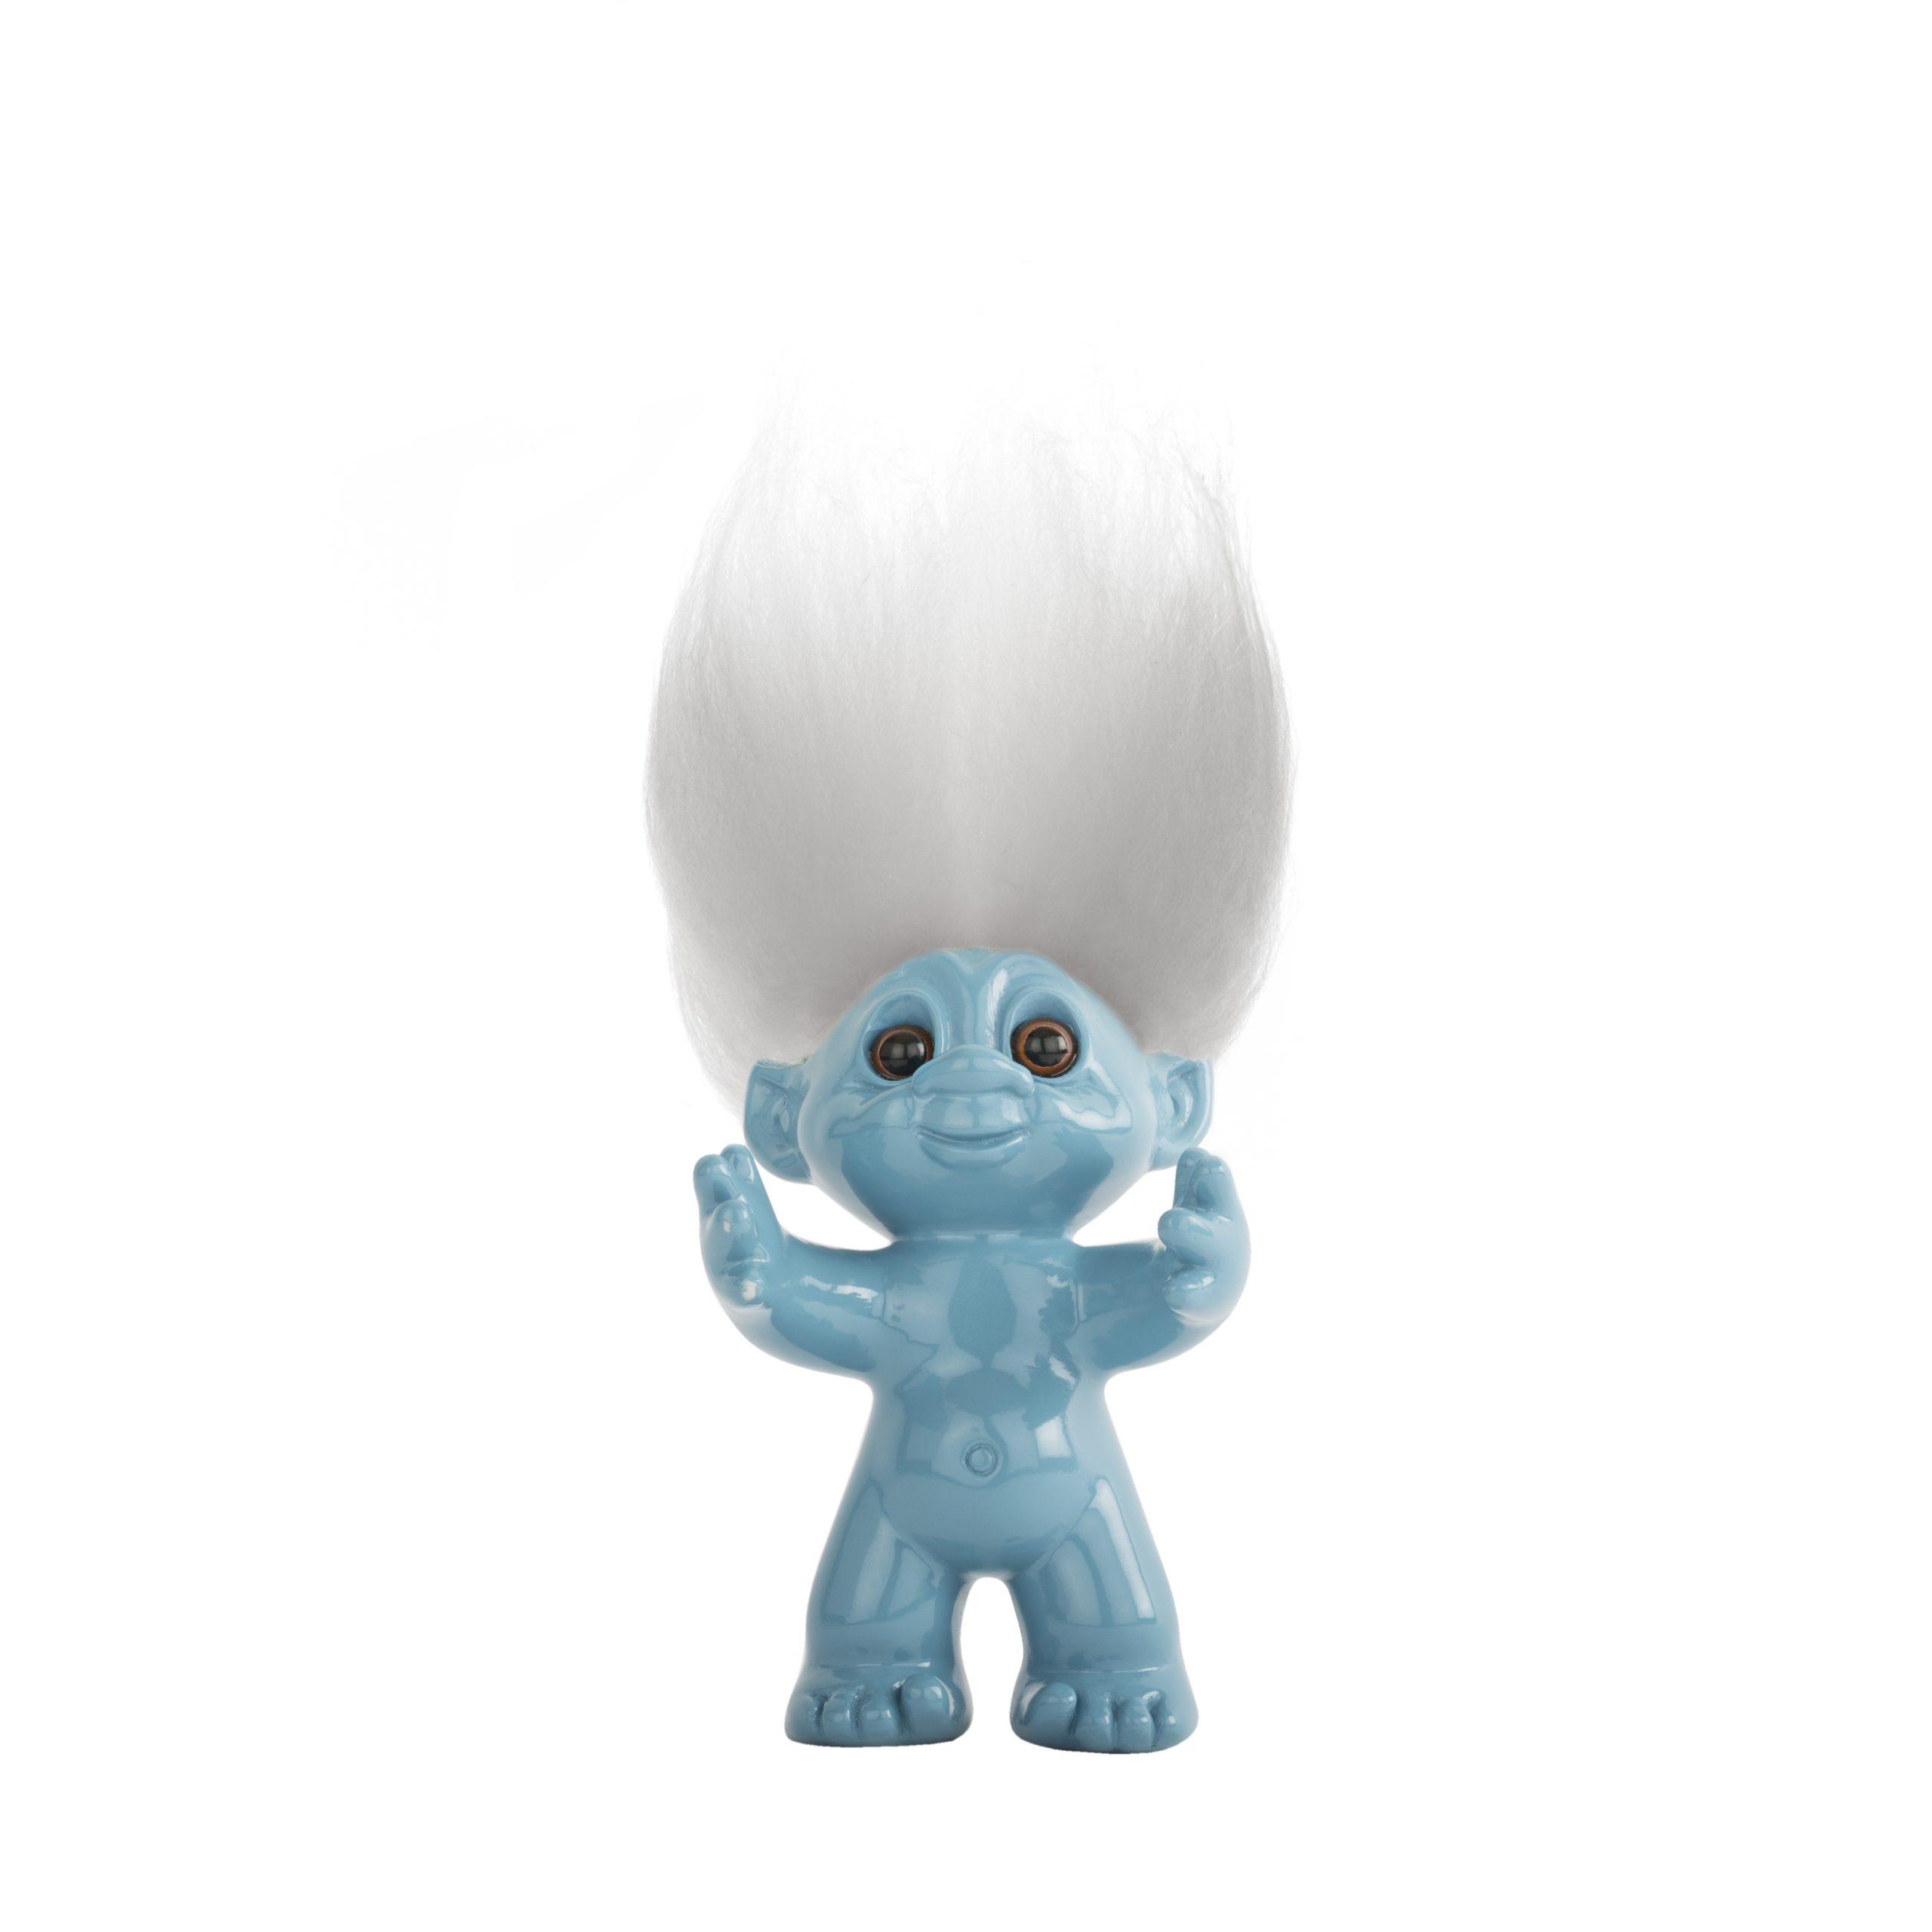 Goodluck Troll – Blue With White Hair